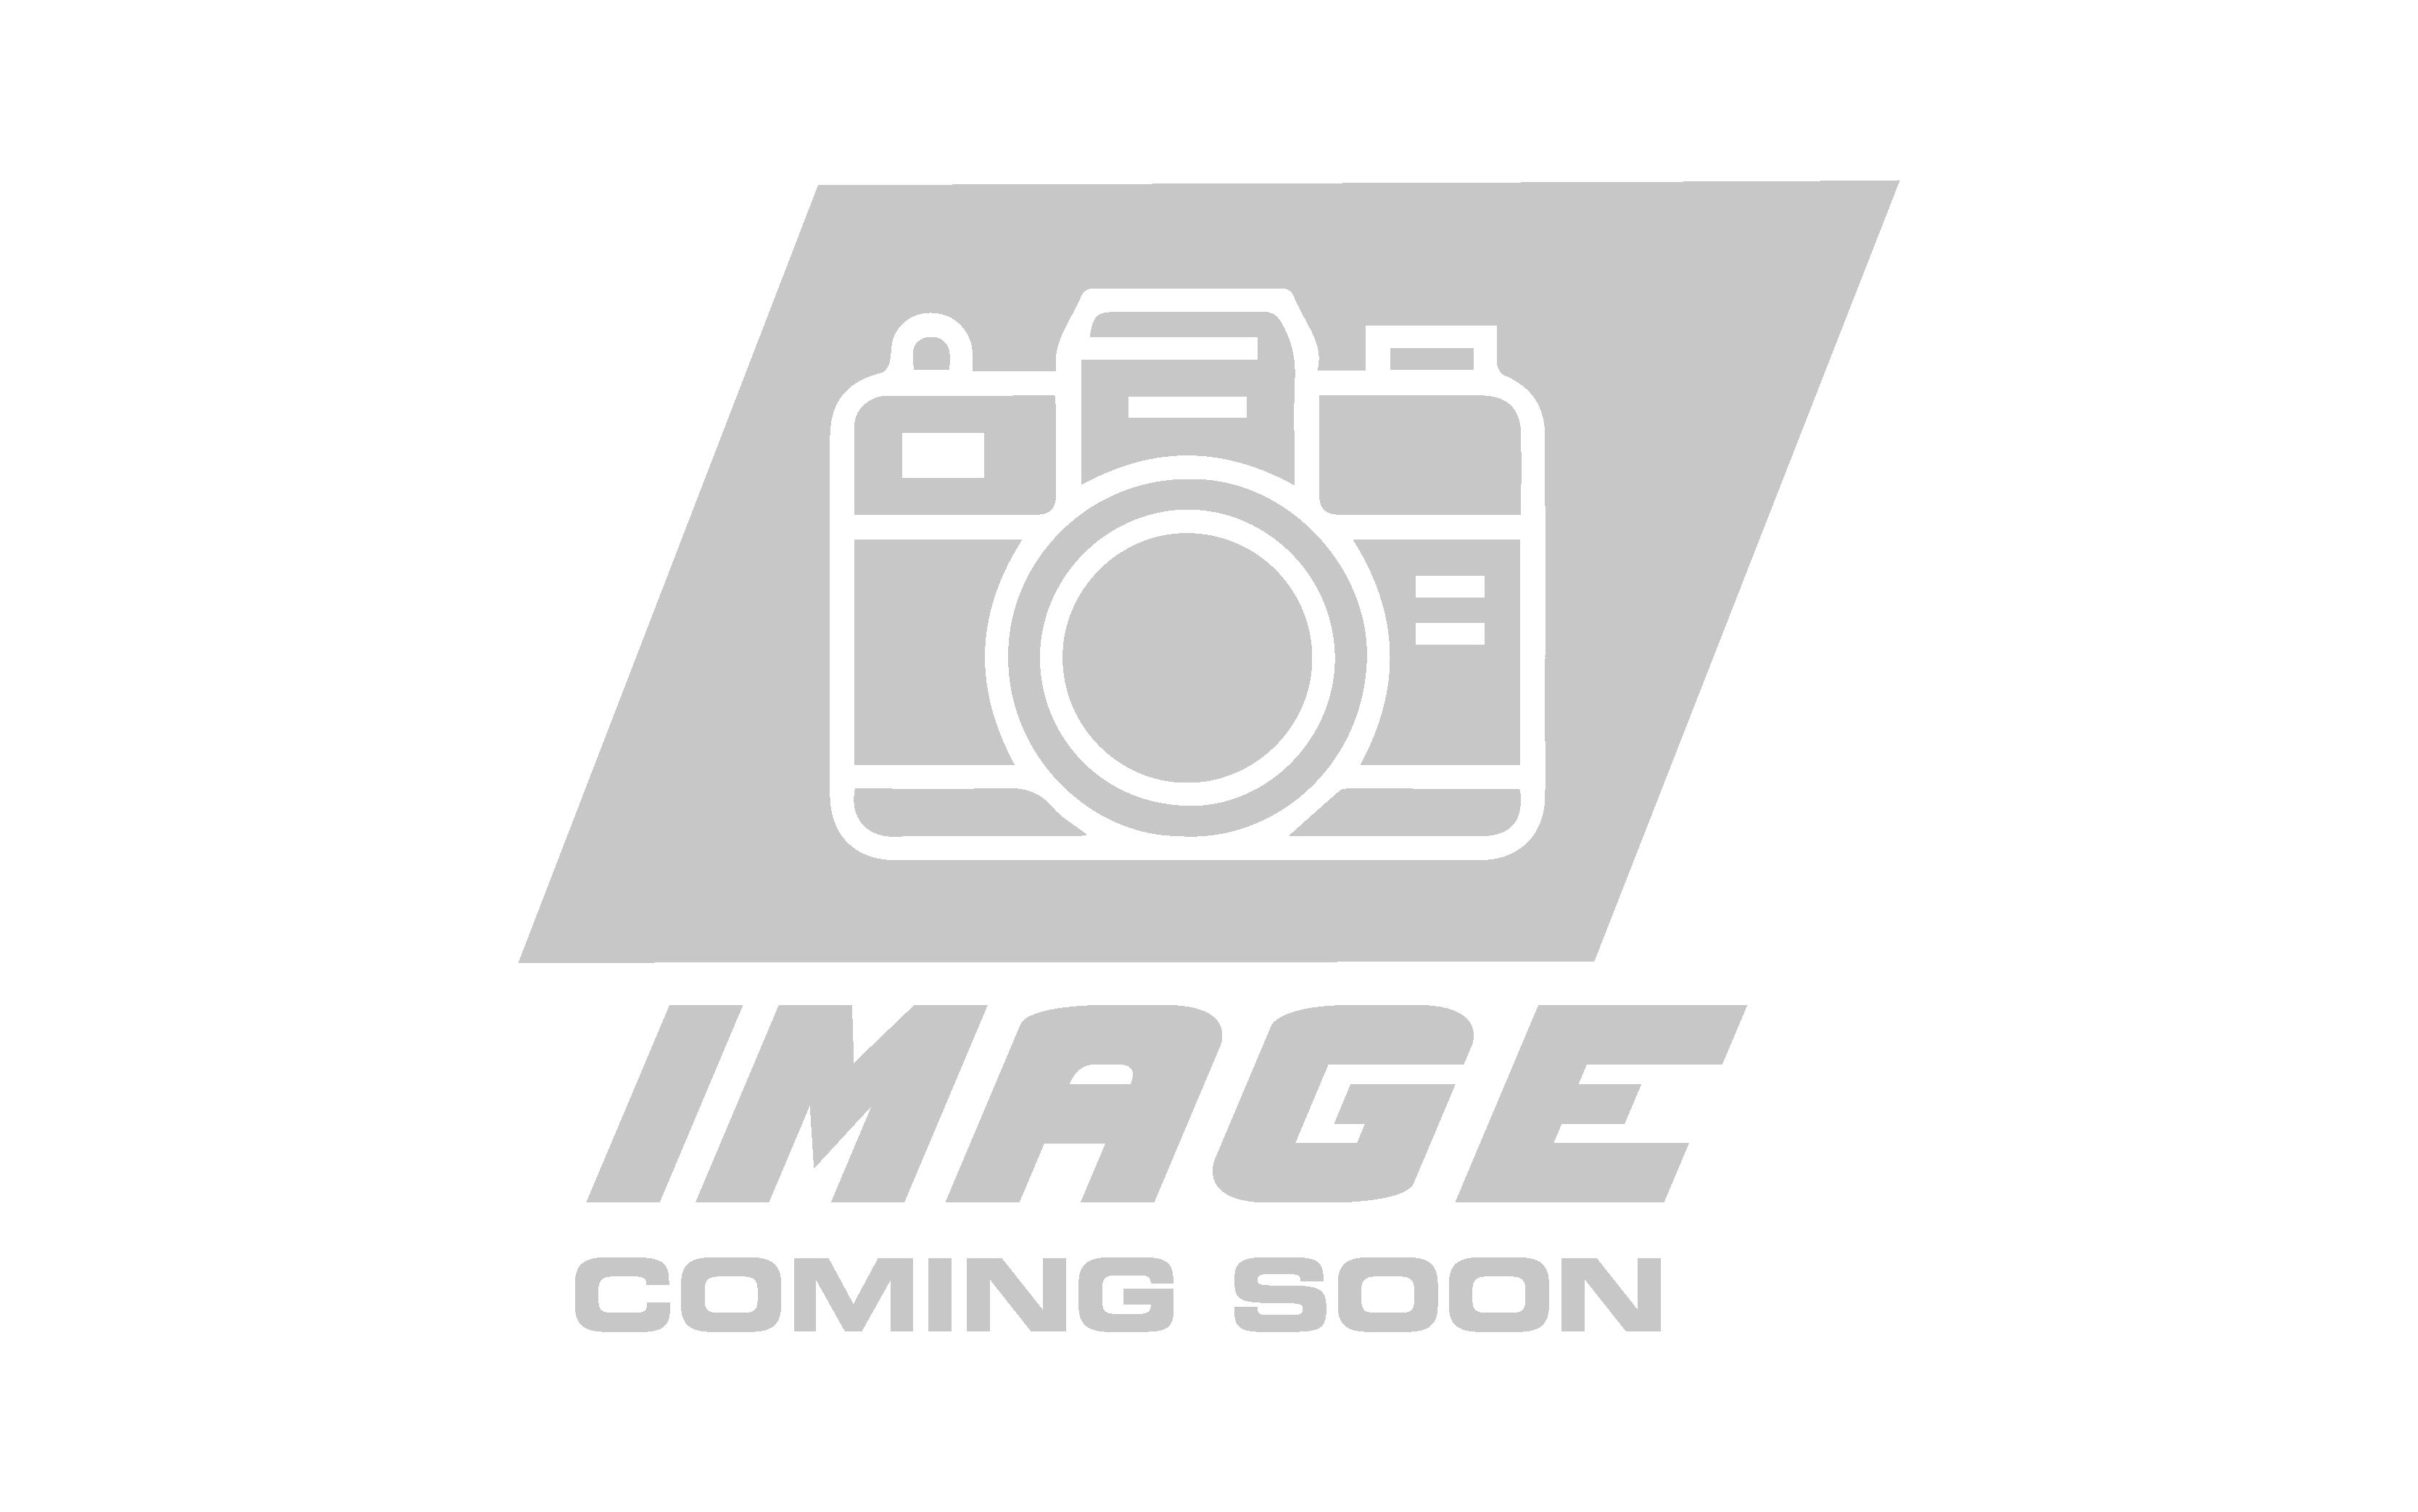 dodge_ram_1500_4th_gen_air_lift_loadlifter_5000_rear_kit_57365